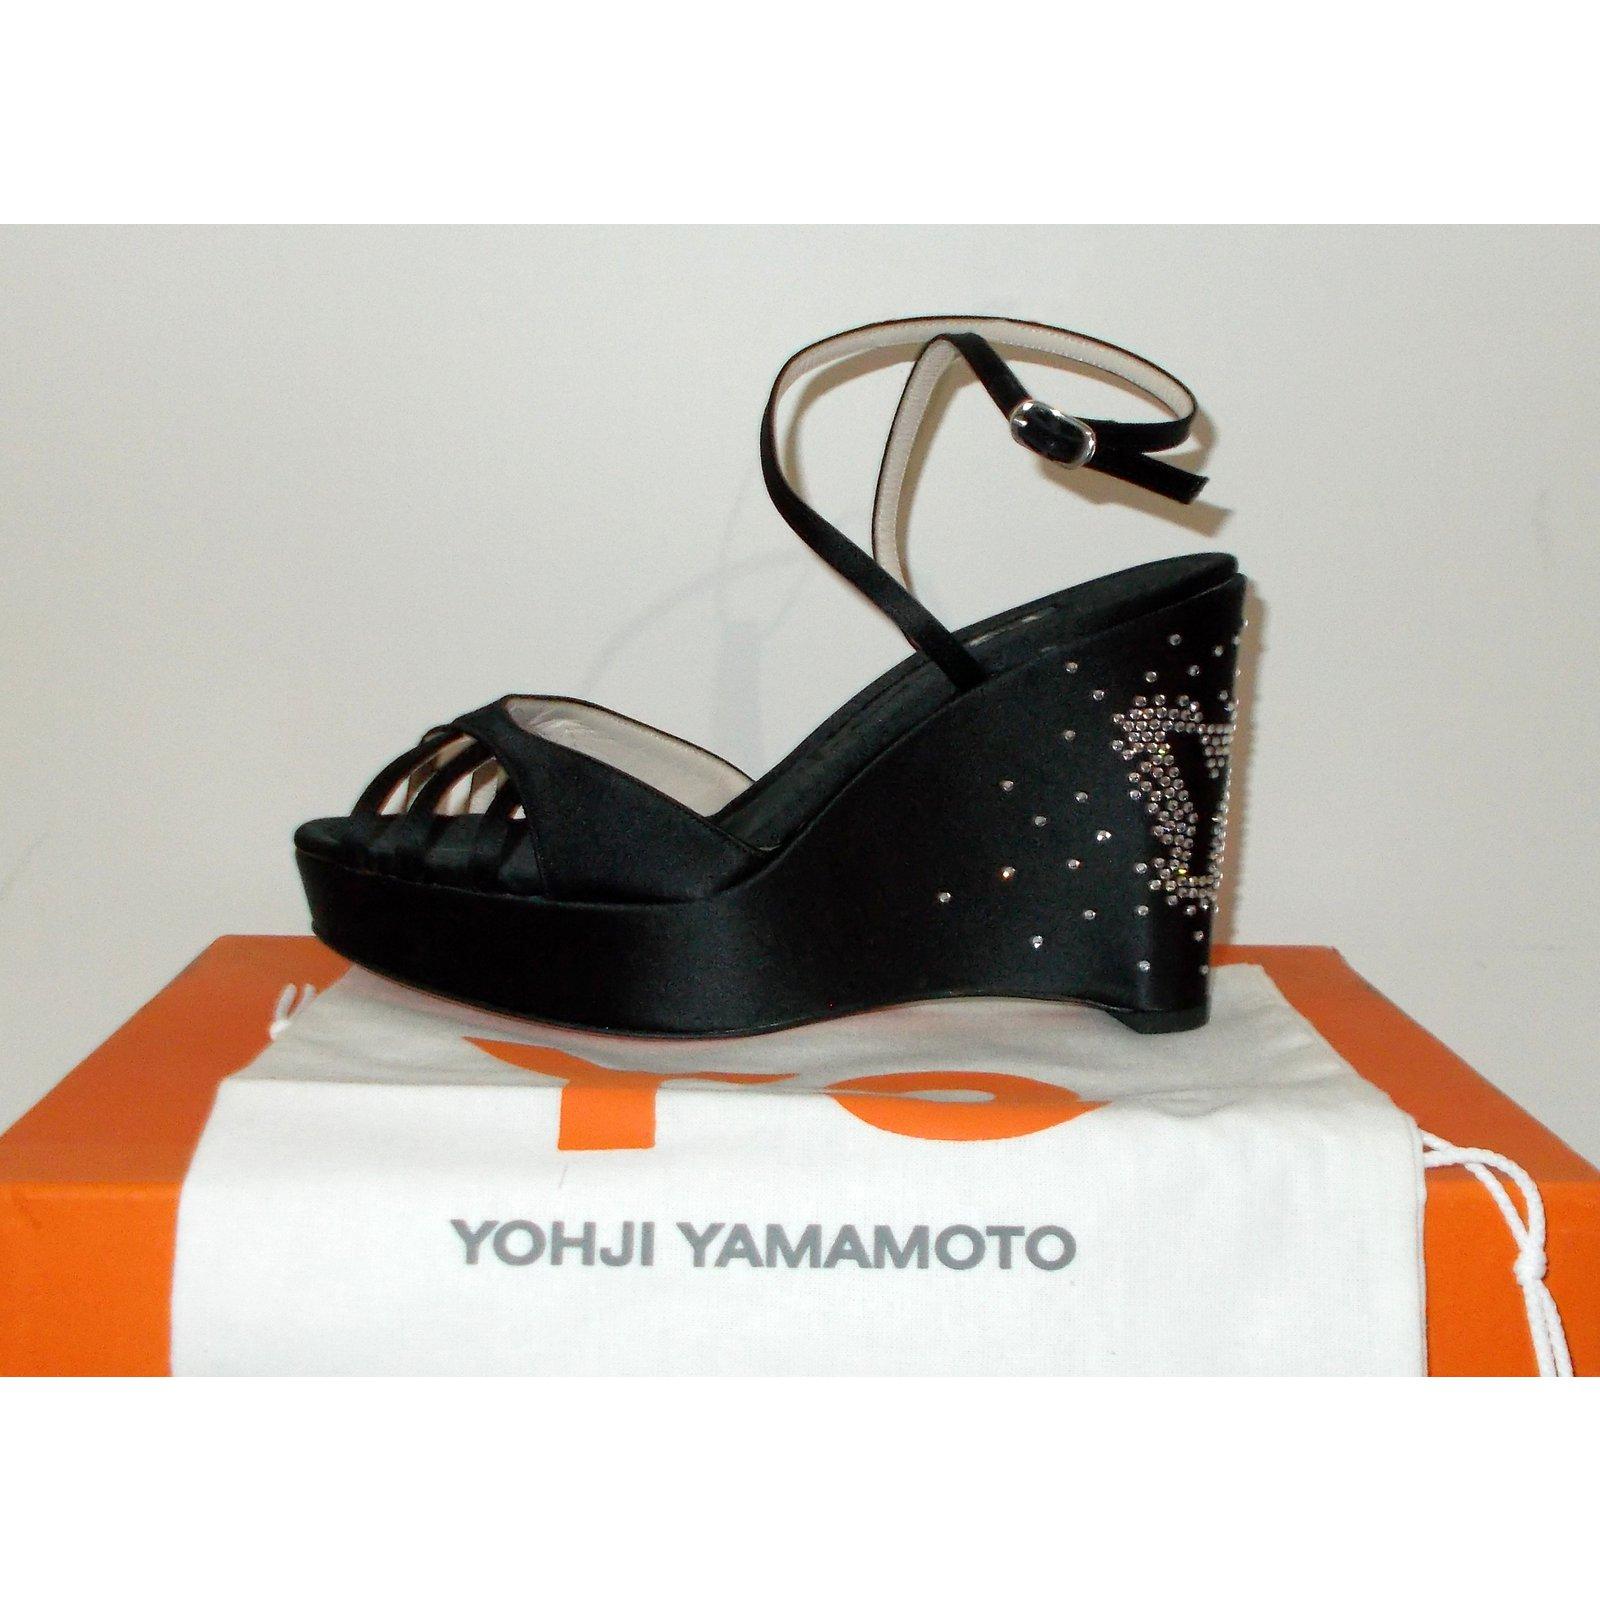 sandales yohji yamamoto sandales strass y 3 yohji yamamoto pour adidas cuir satin noir. Black Bedroom Furniture Sets. Home Design Ideas